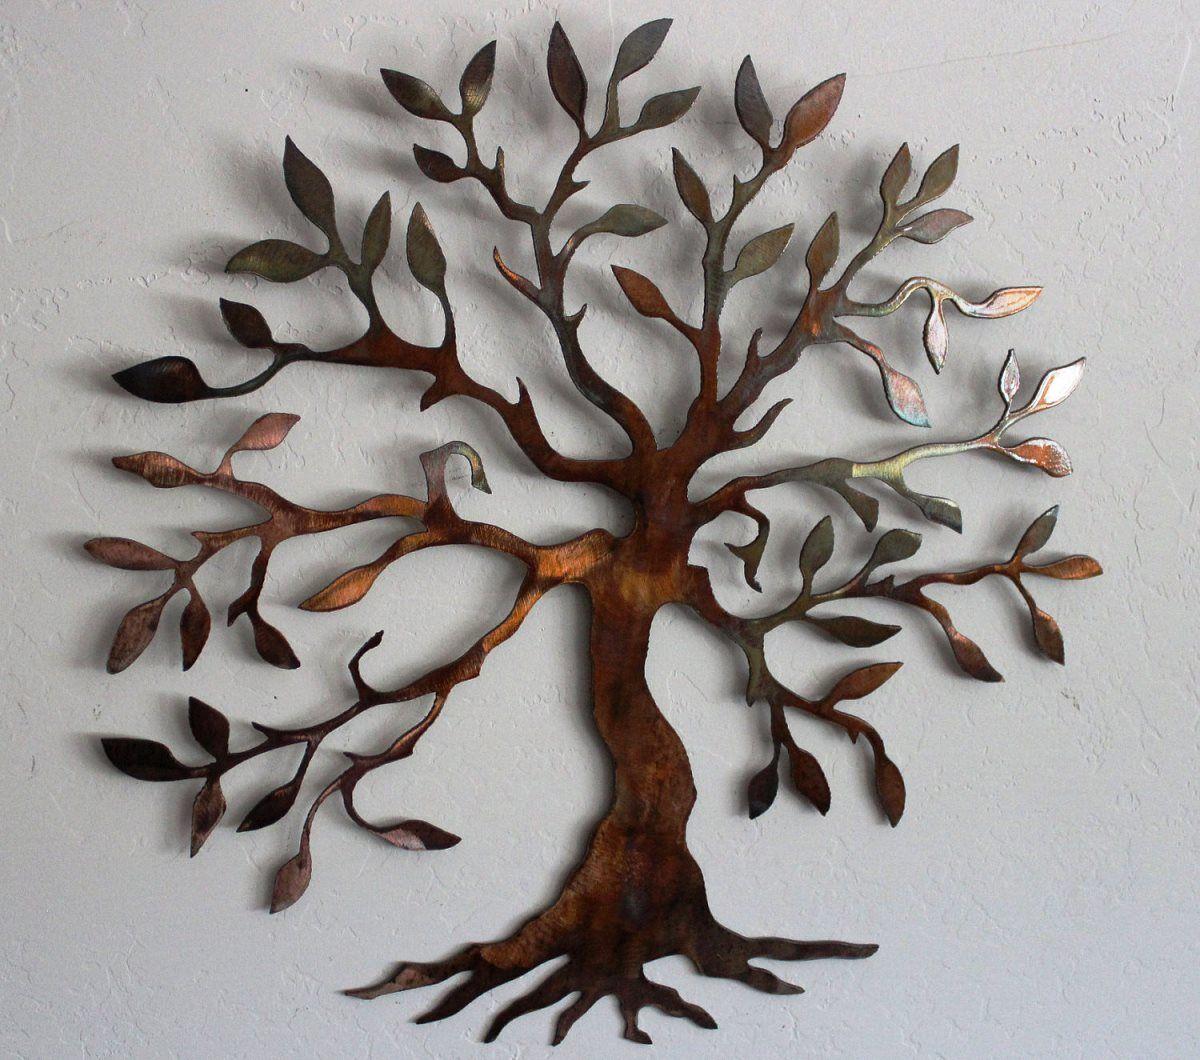 Metal Tree Wall Hanging Metal Wall Decor 2014  Wall Art Decor  Pinterest  Metal Walls